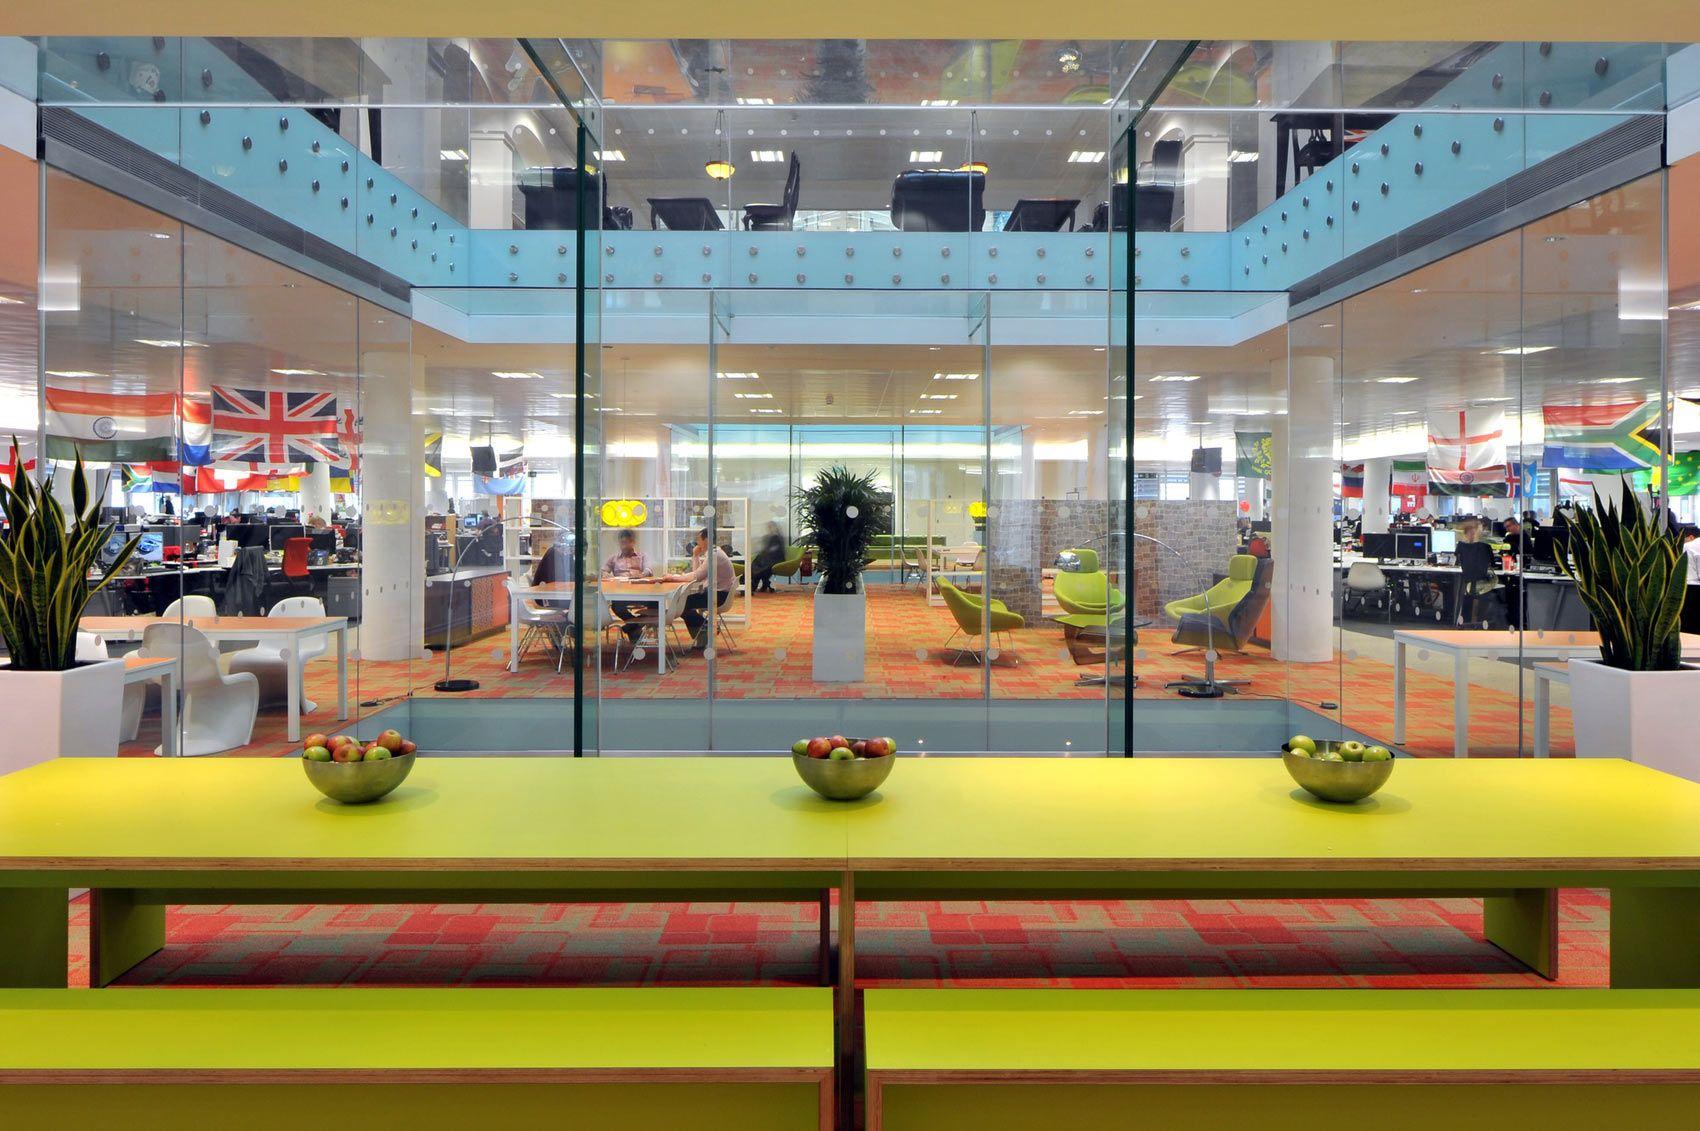 rackspace uk office. Inspirational Office Design | Gallery Rackspace Uk O